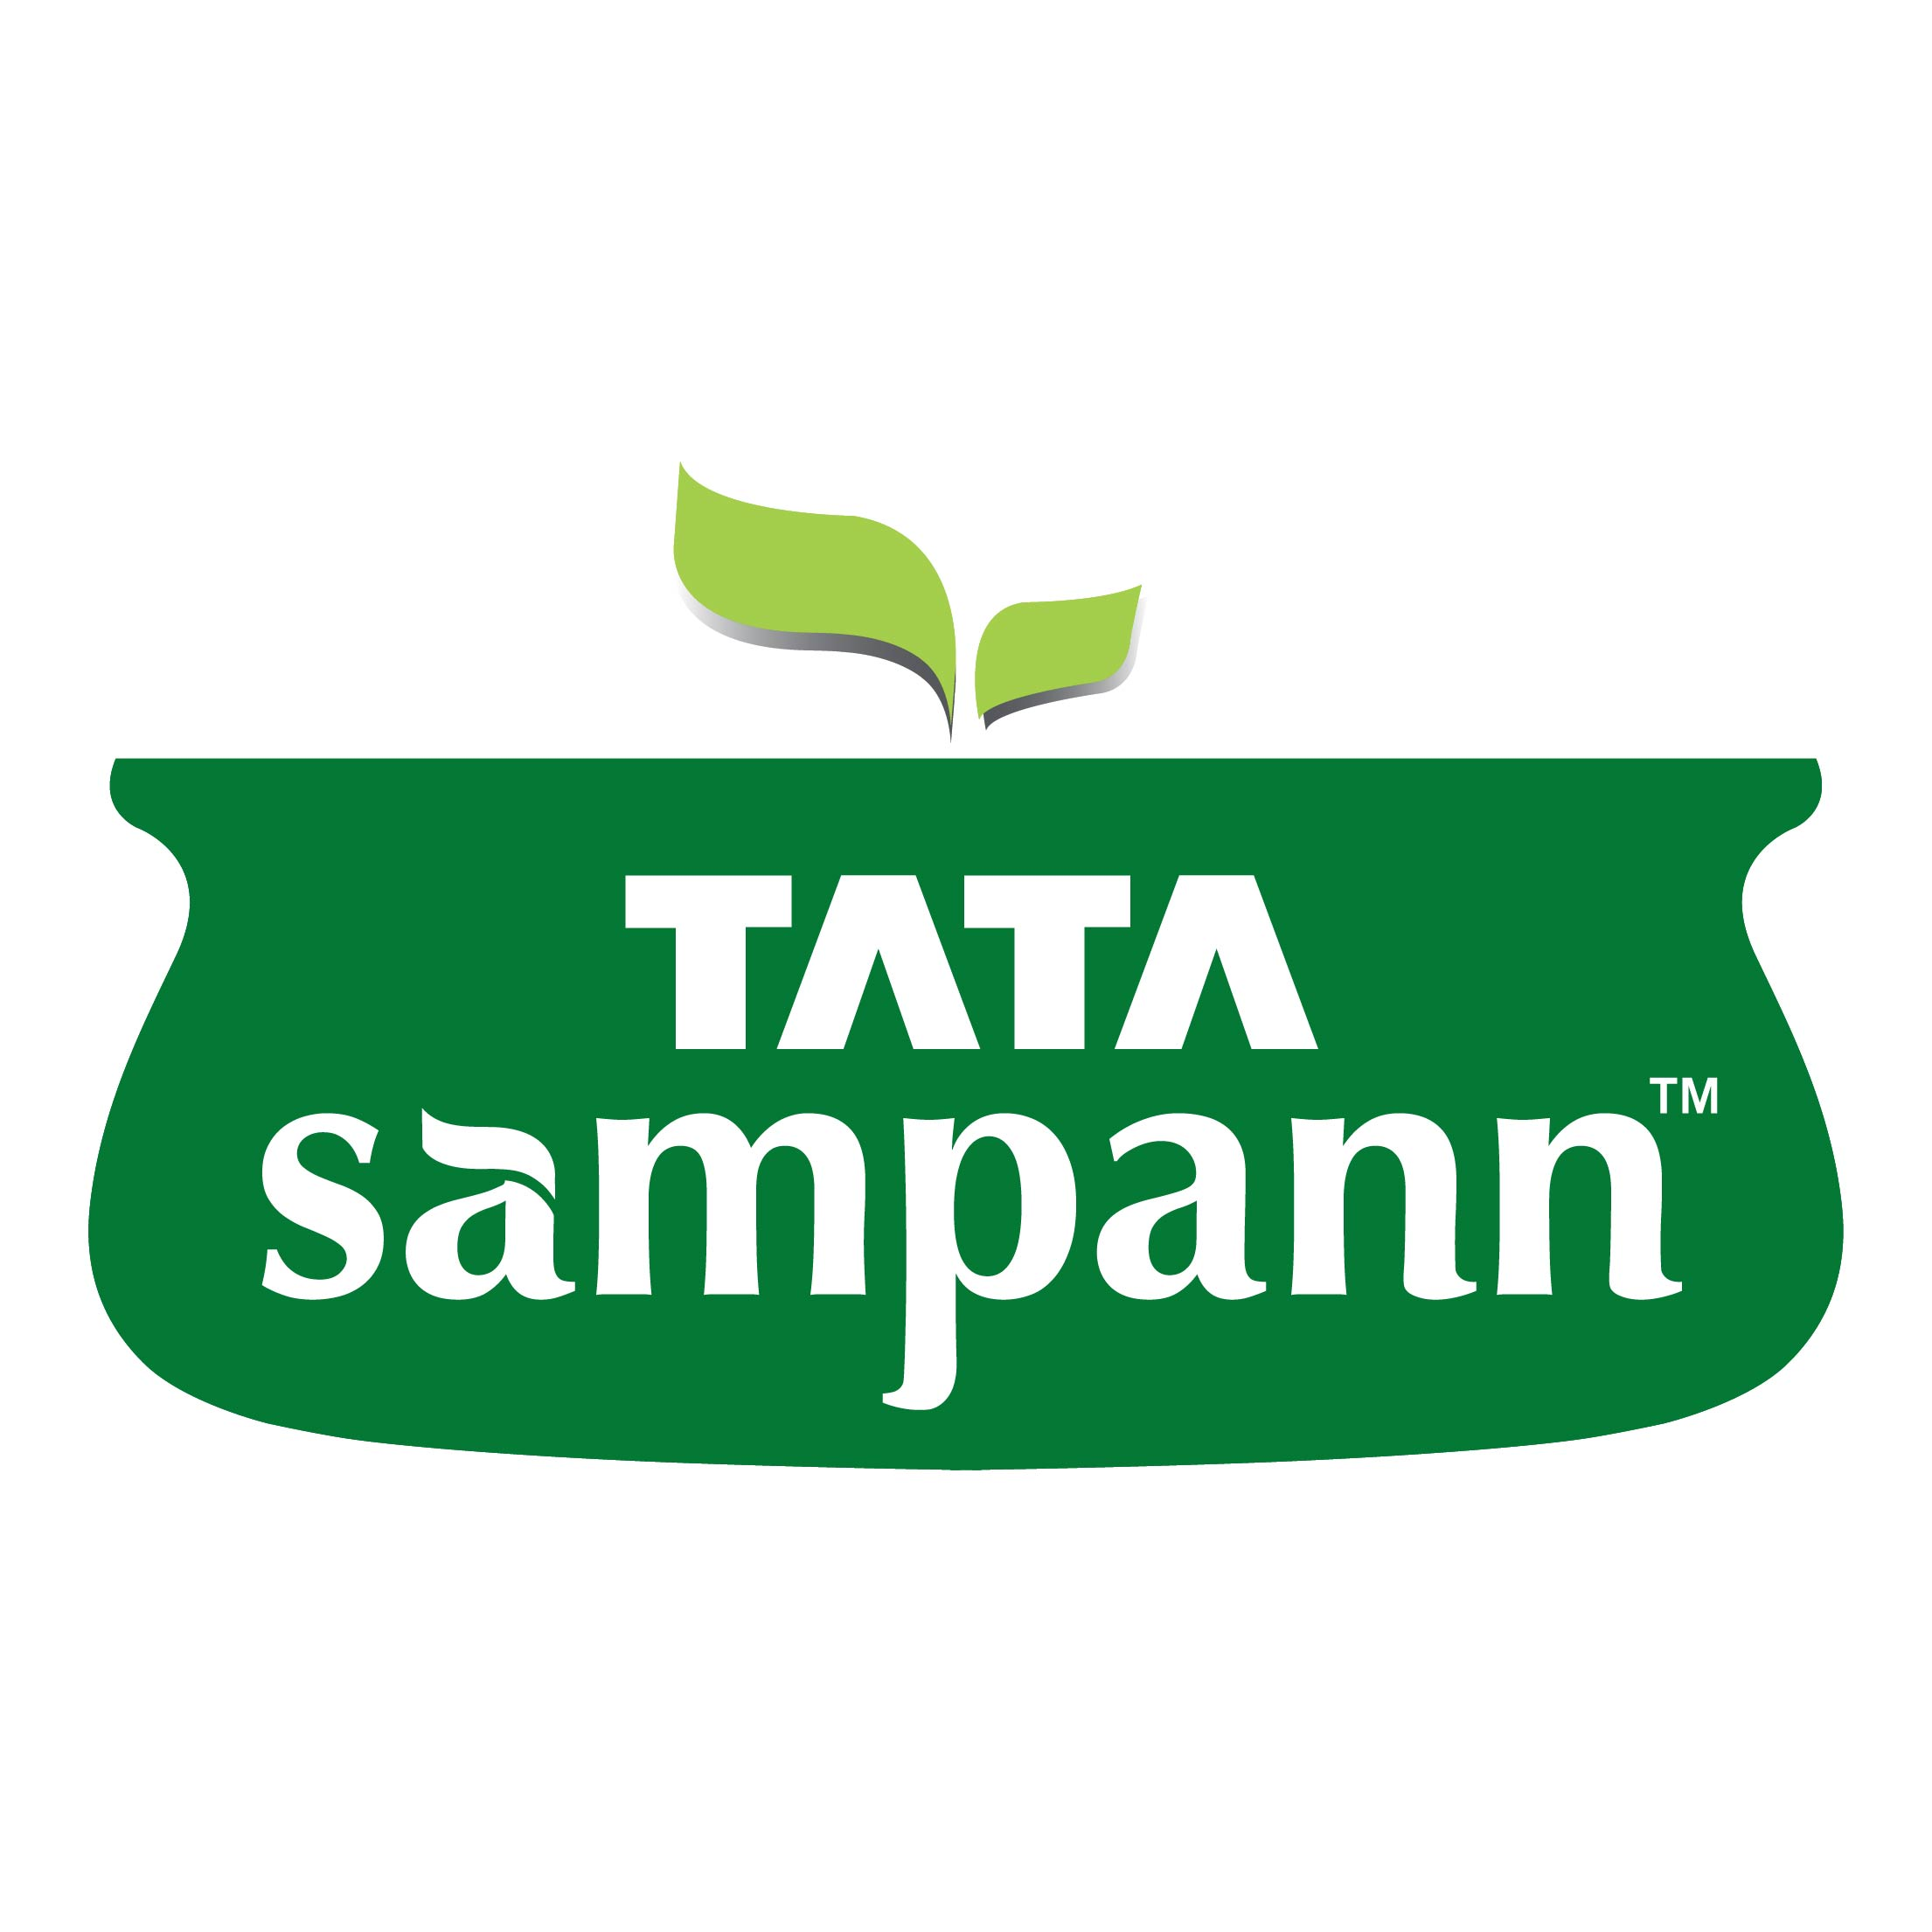 Tata Sampann_Packaging_Elephant Design 6.jpg